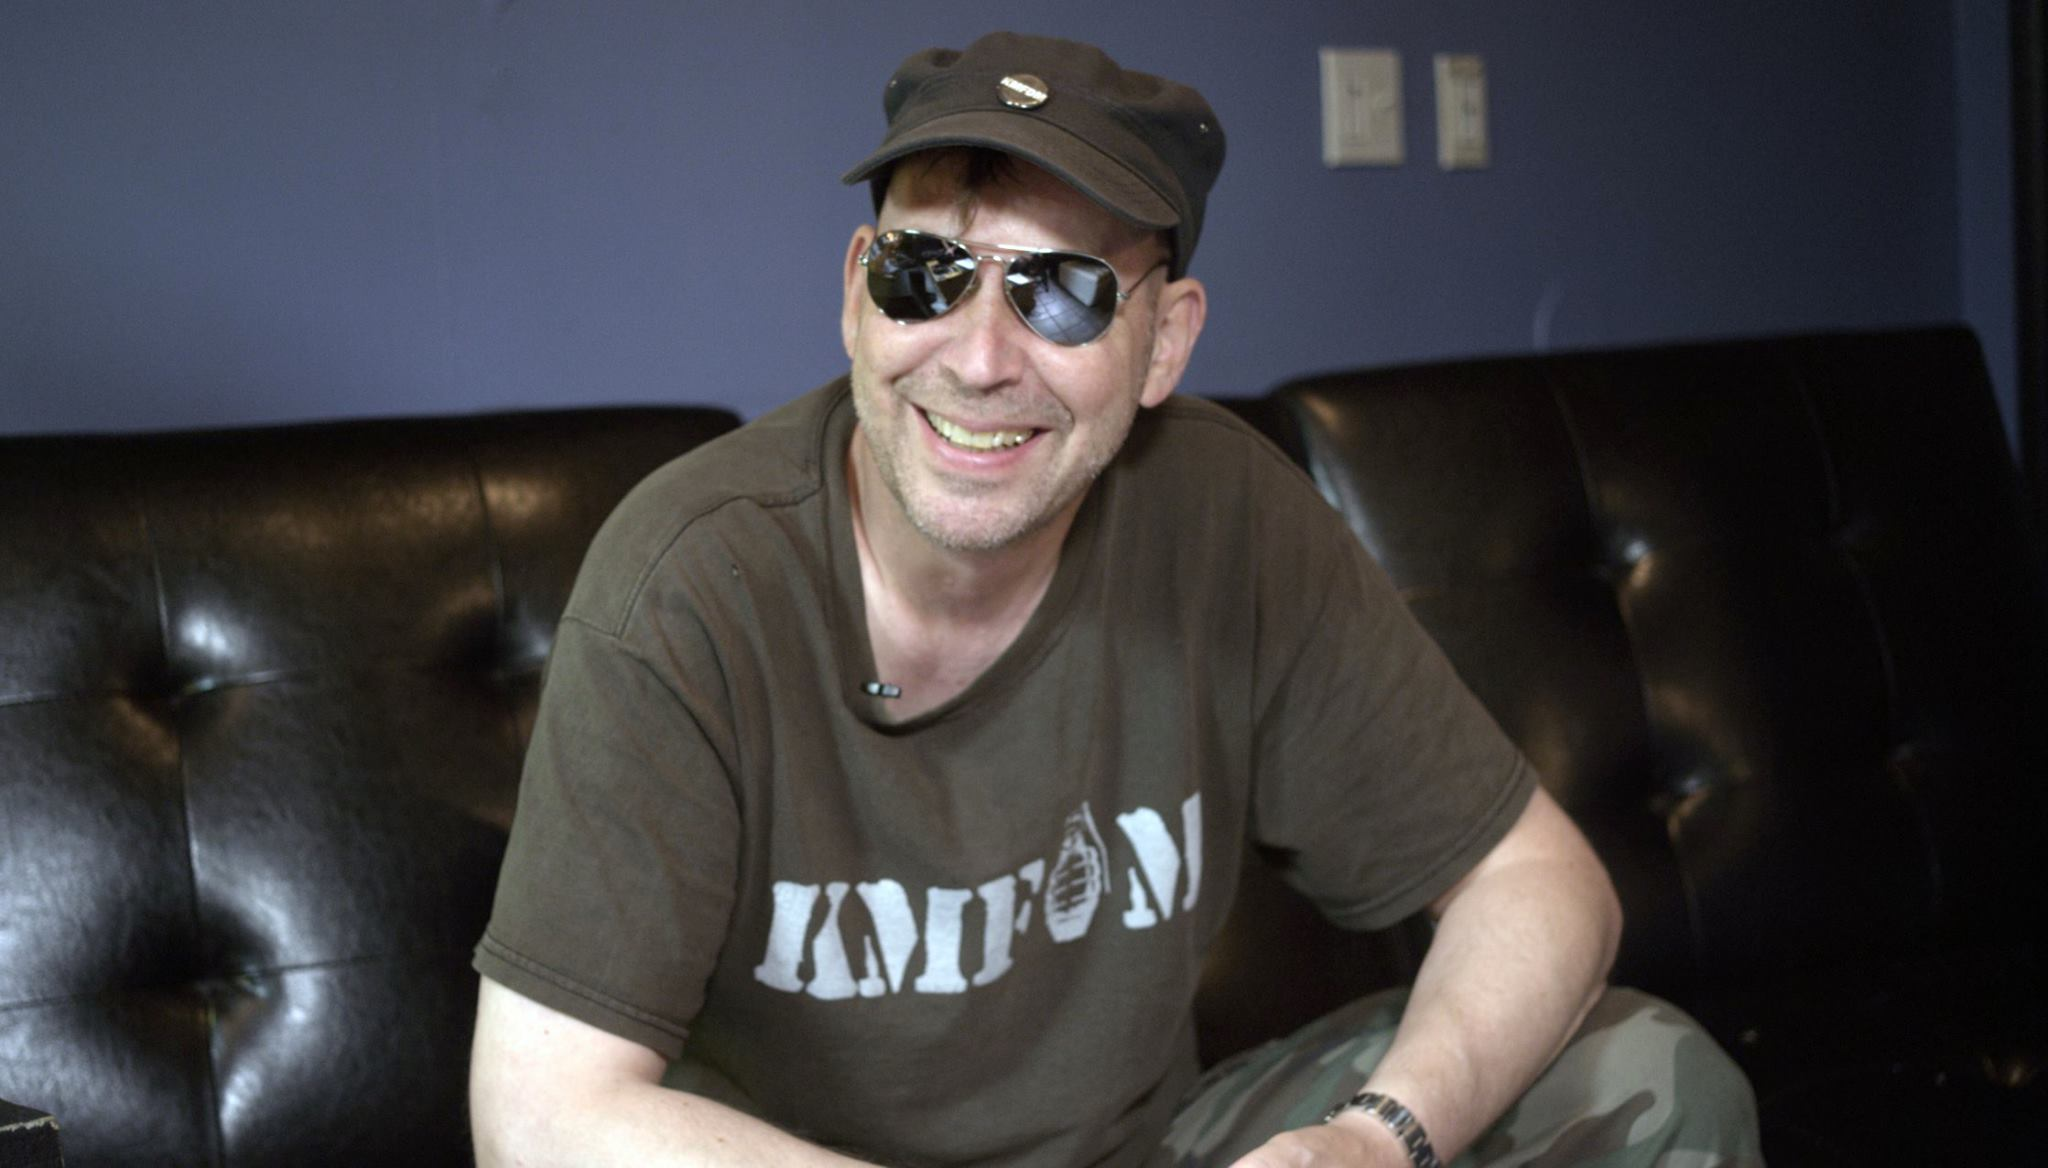 Interview with Sascha Konietzko from KMFDM